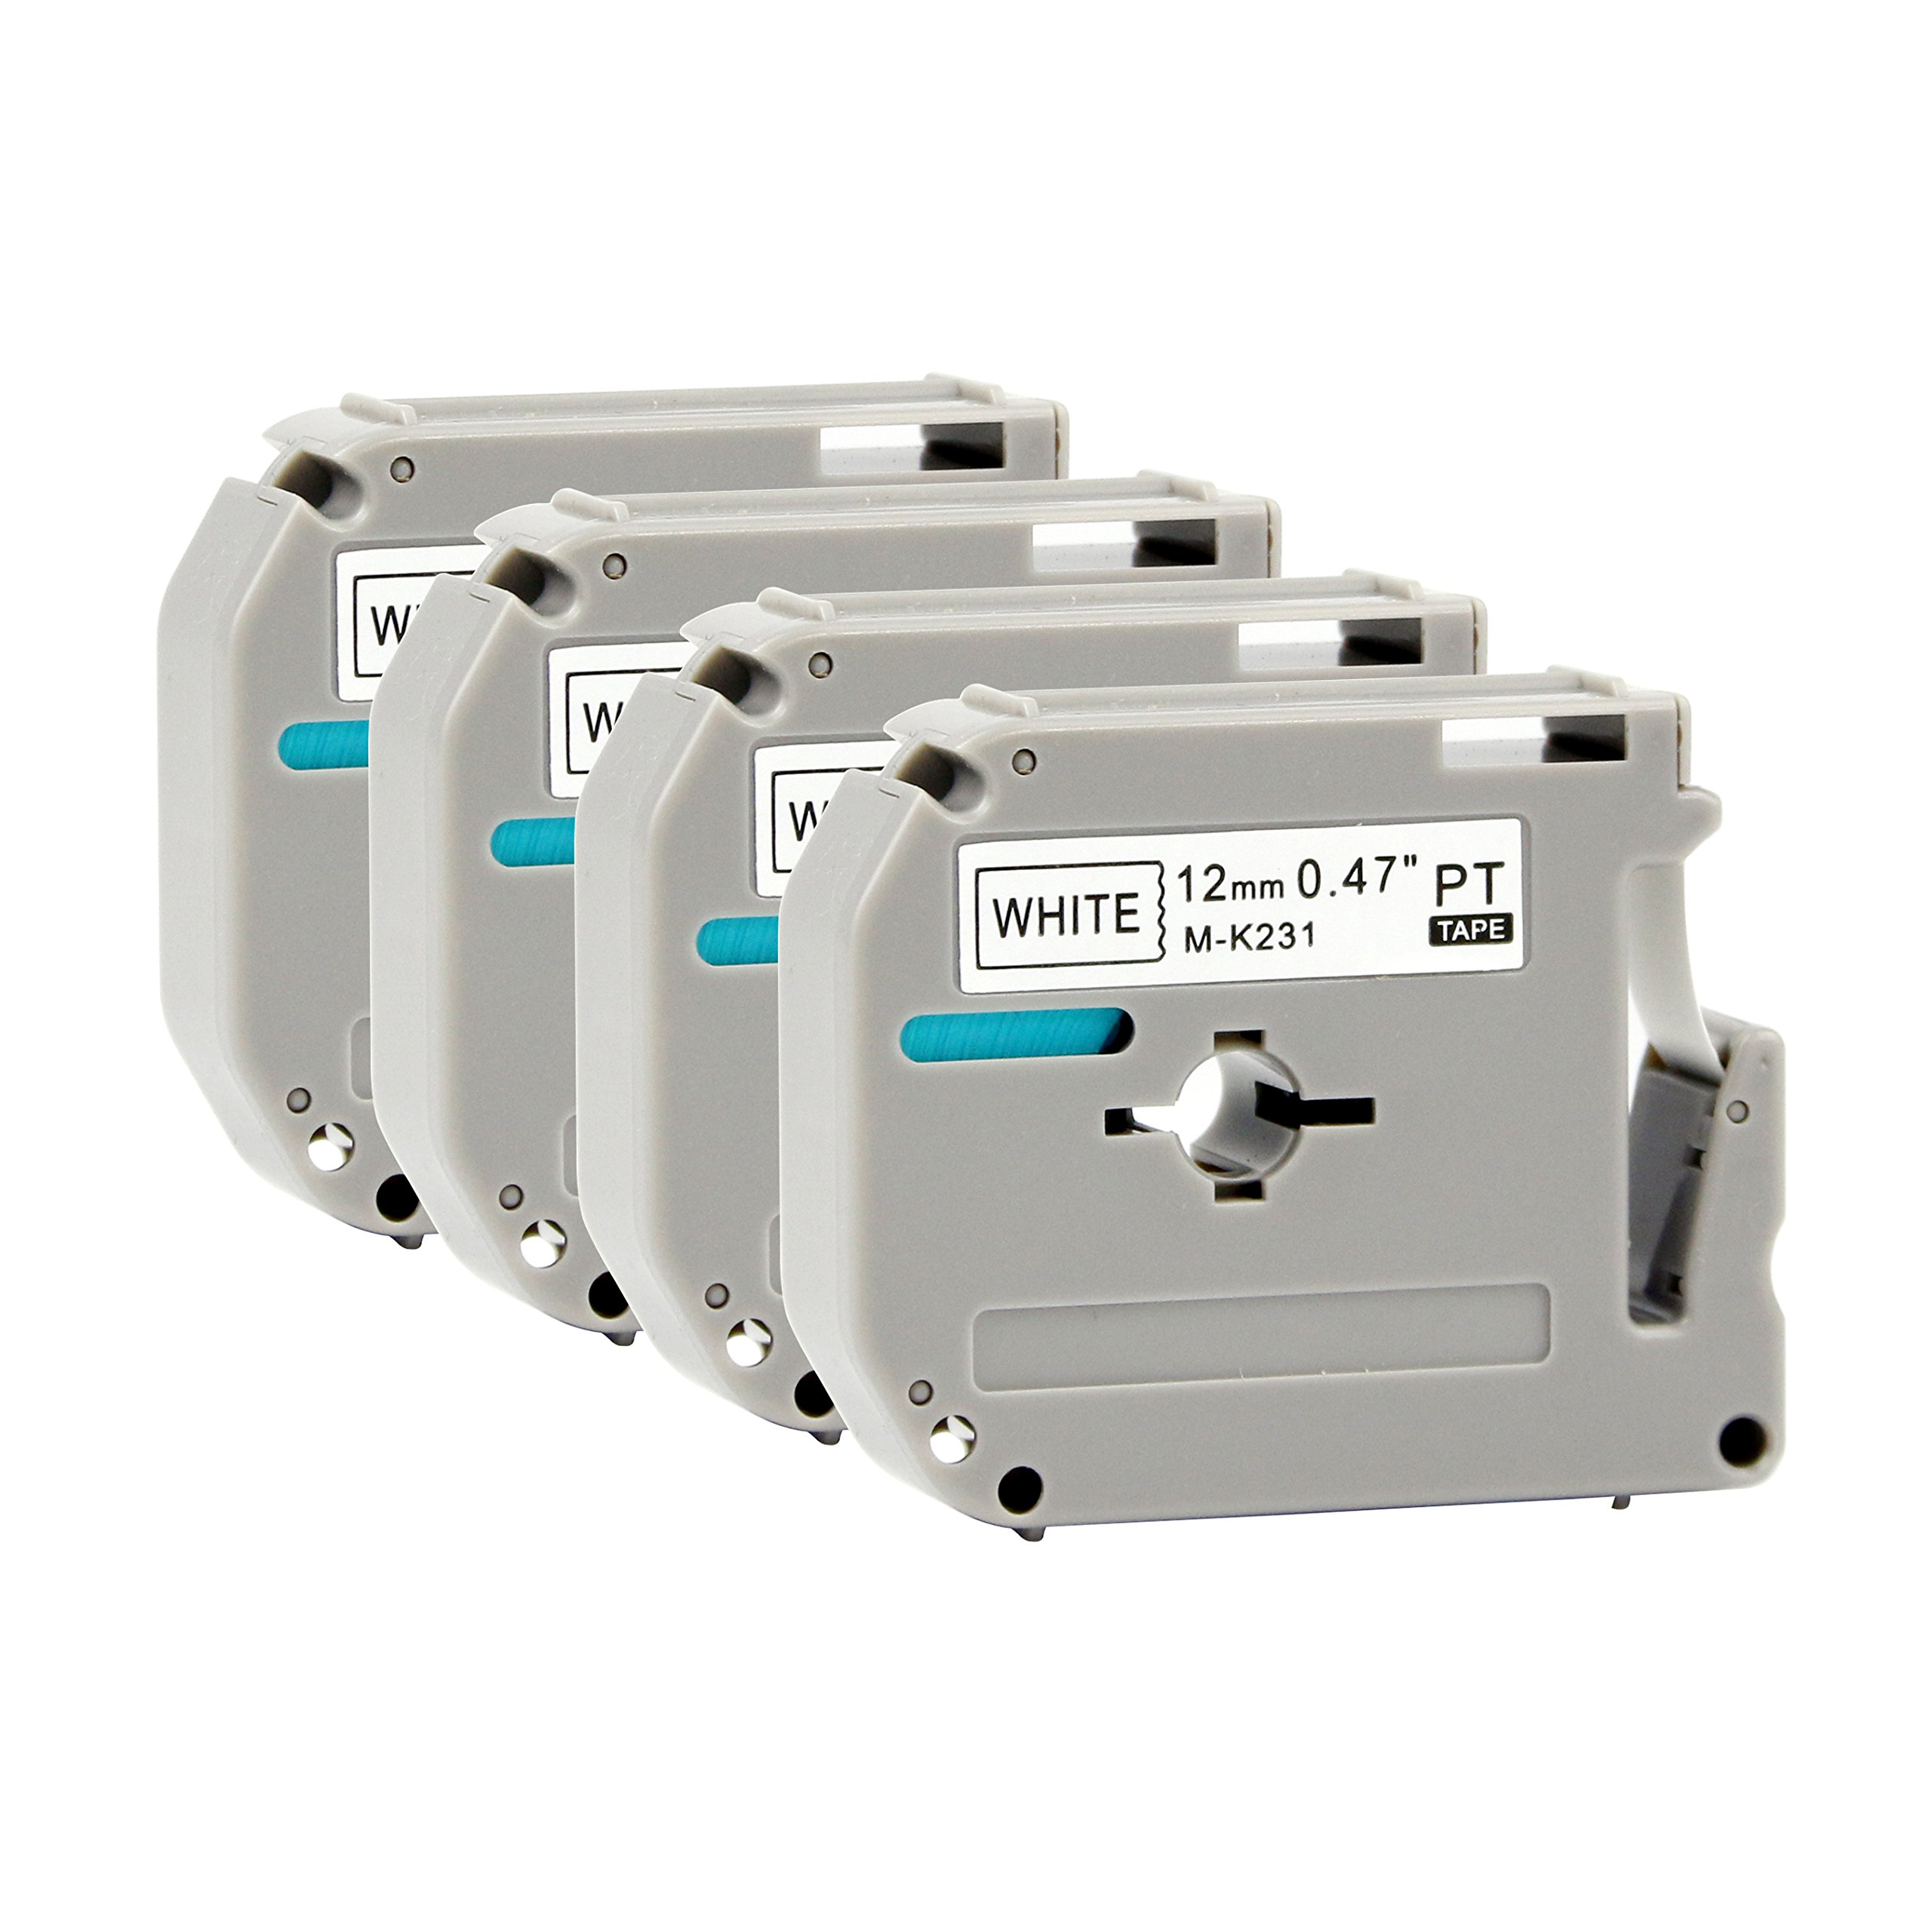 0.47inch P-Touch M Label Tape M231 MK231 M-K231 MK-231 12mm 26.2ft 1/2-Inch Black on White Compatible for Brother P Touch Printer PT-90 PT-M95 PT-70BM PT-70 PT-65 PT-85 PT-45 4-Pack